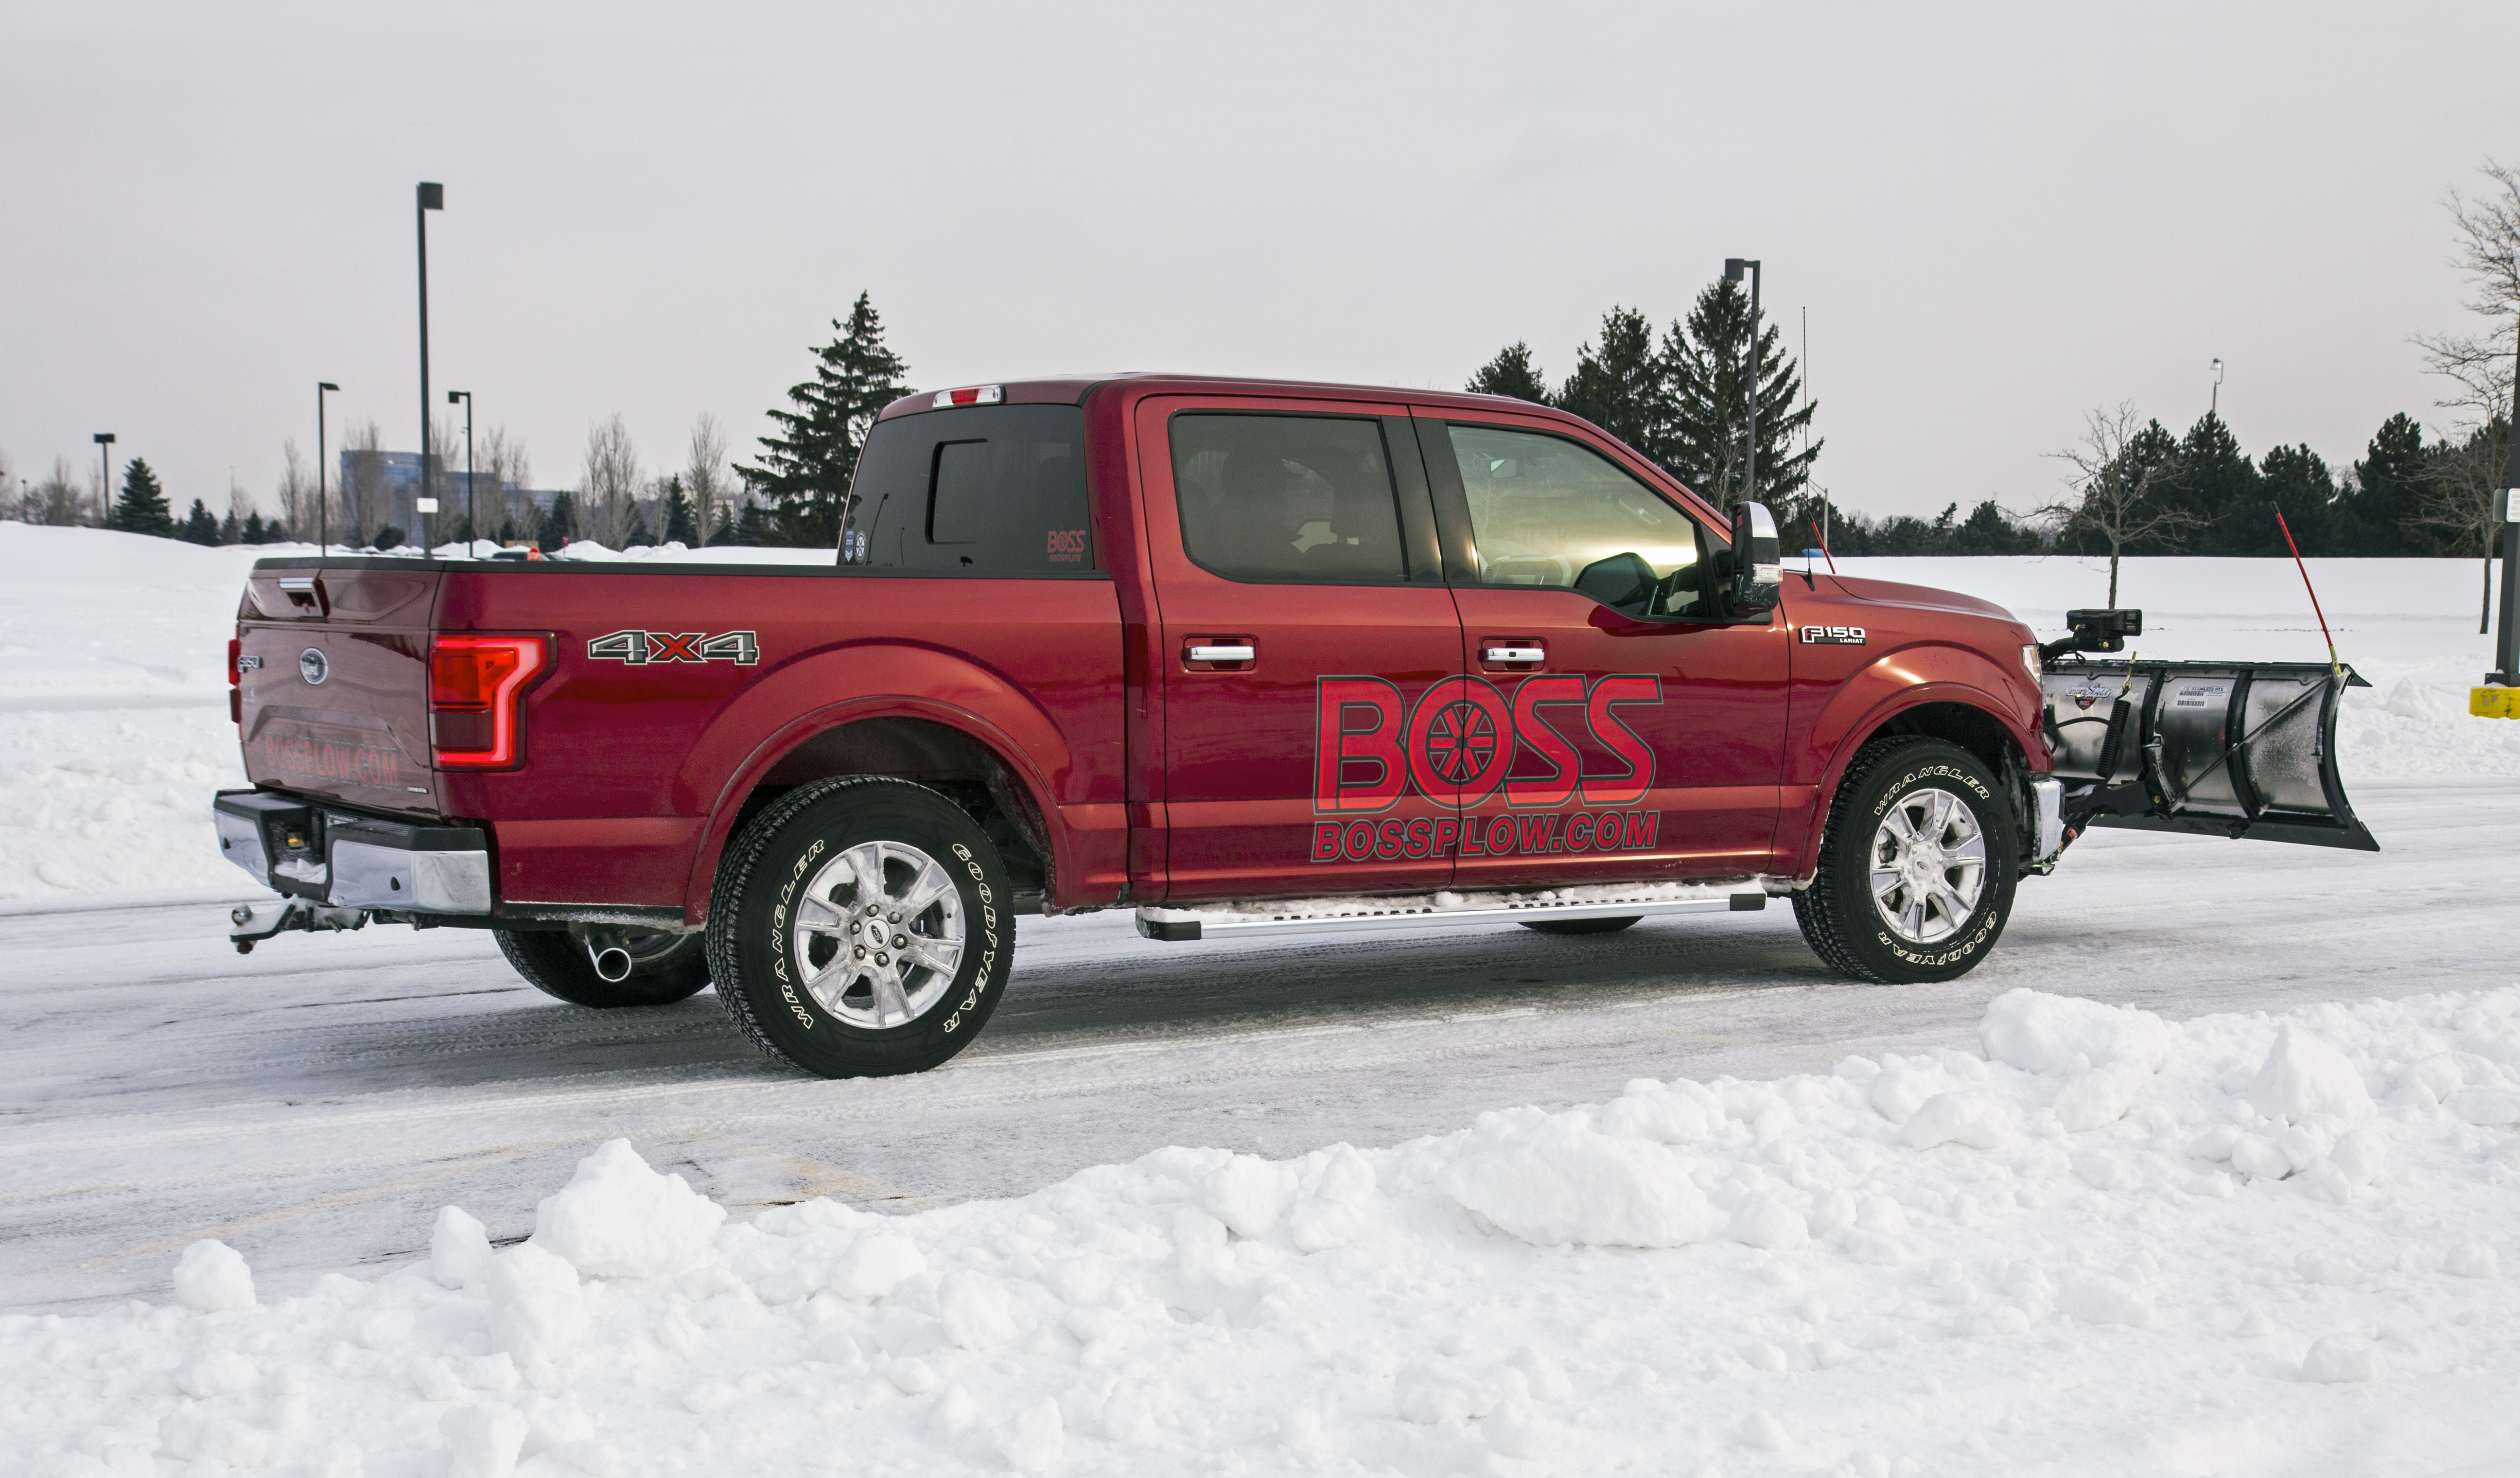 Ford F 150 Snow Plow >> 2015 Ford F-150 Snow Plow Option Costs 50 Bucks Sans the Plow - autoevolution